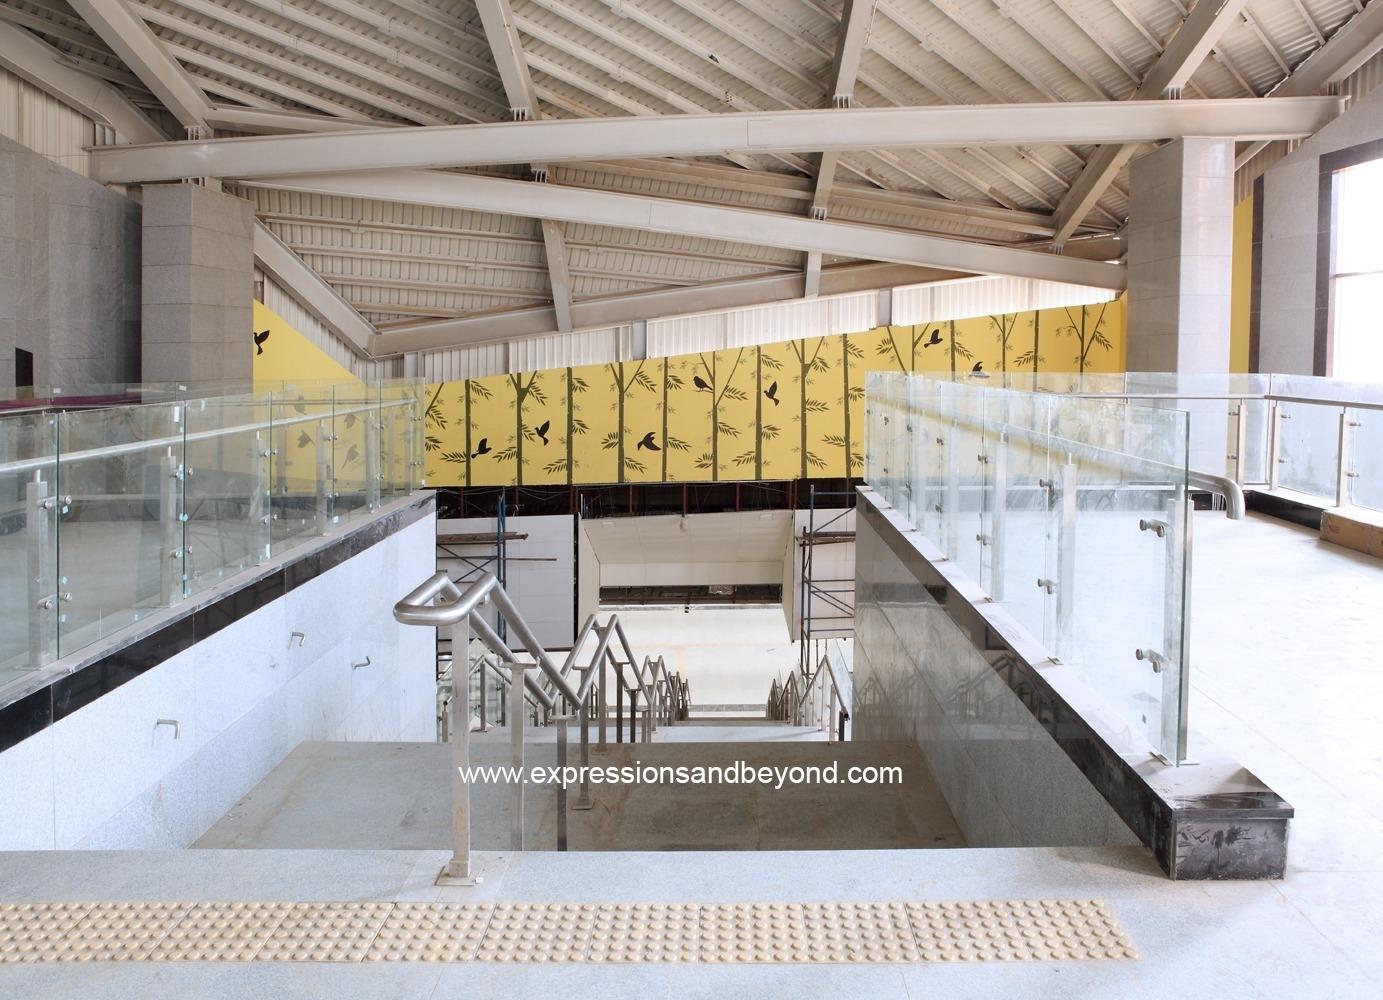 Industrial photography in Delhi, Gurgaon, Noida - India